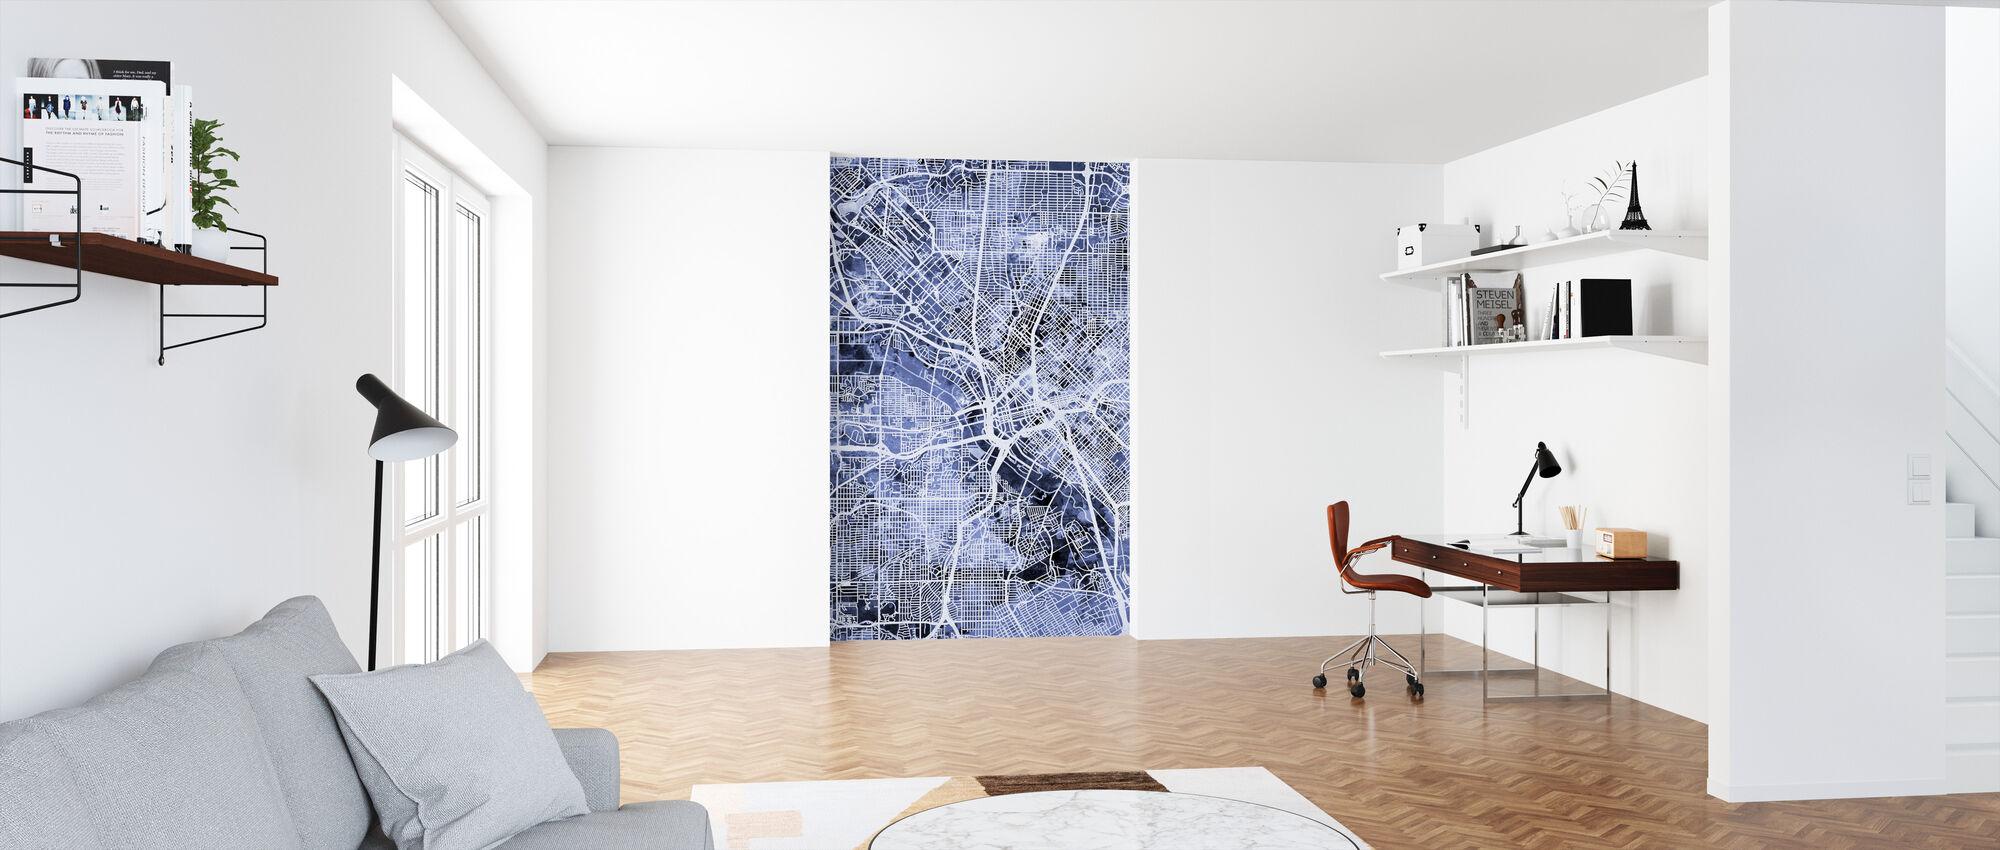 Dallas Texas City Map - Wallpaper - Office